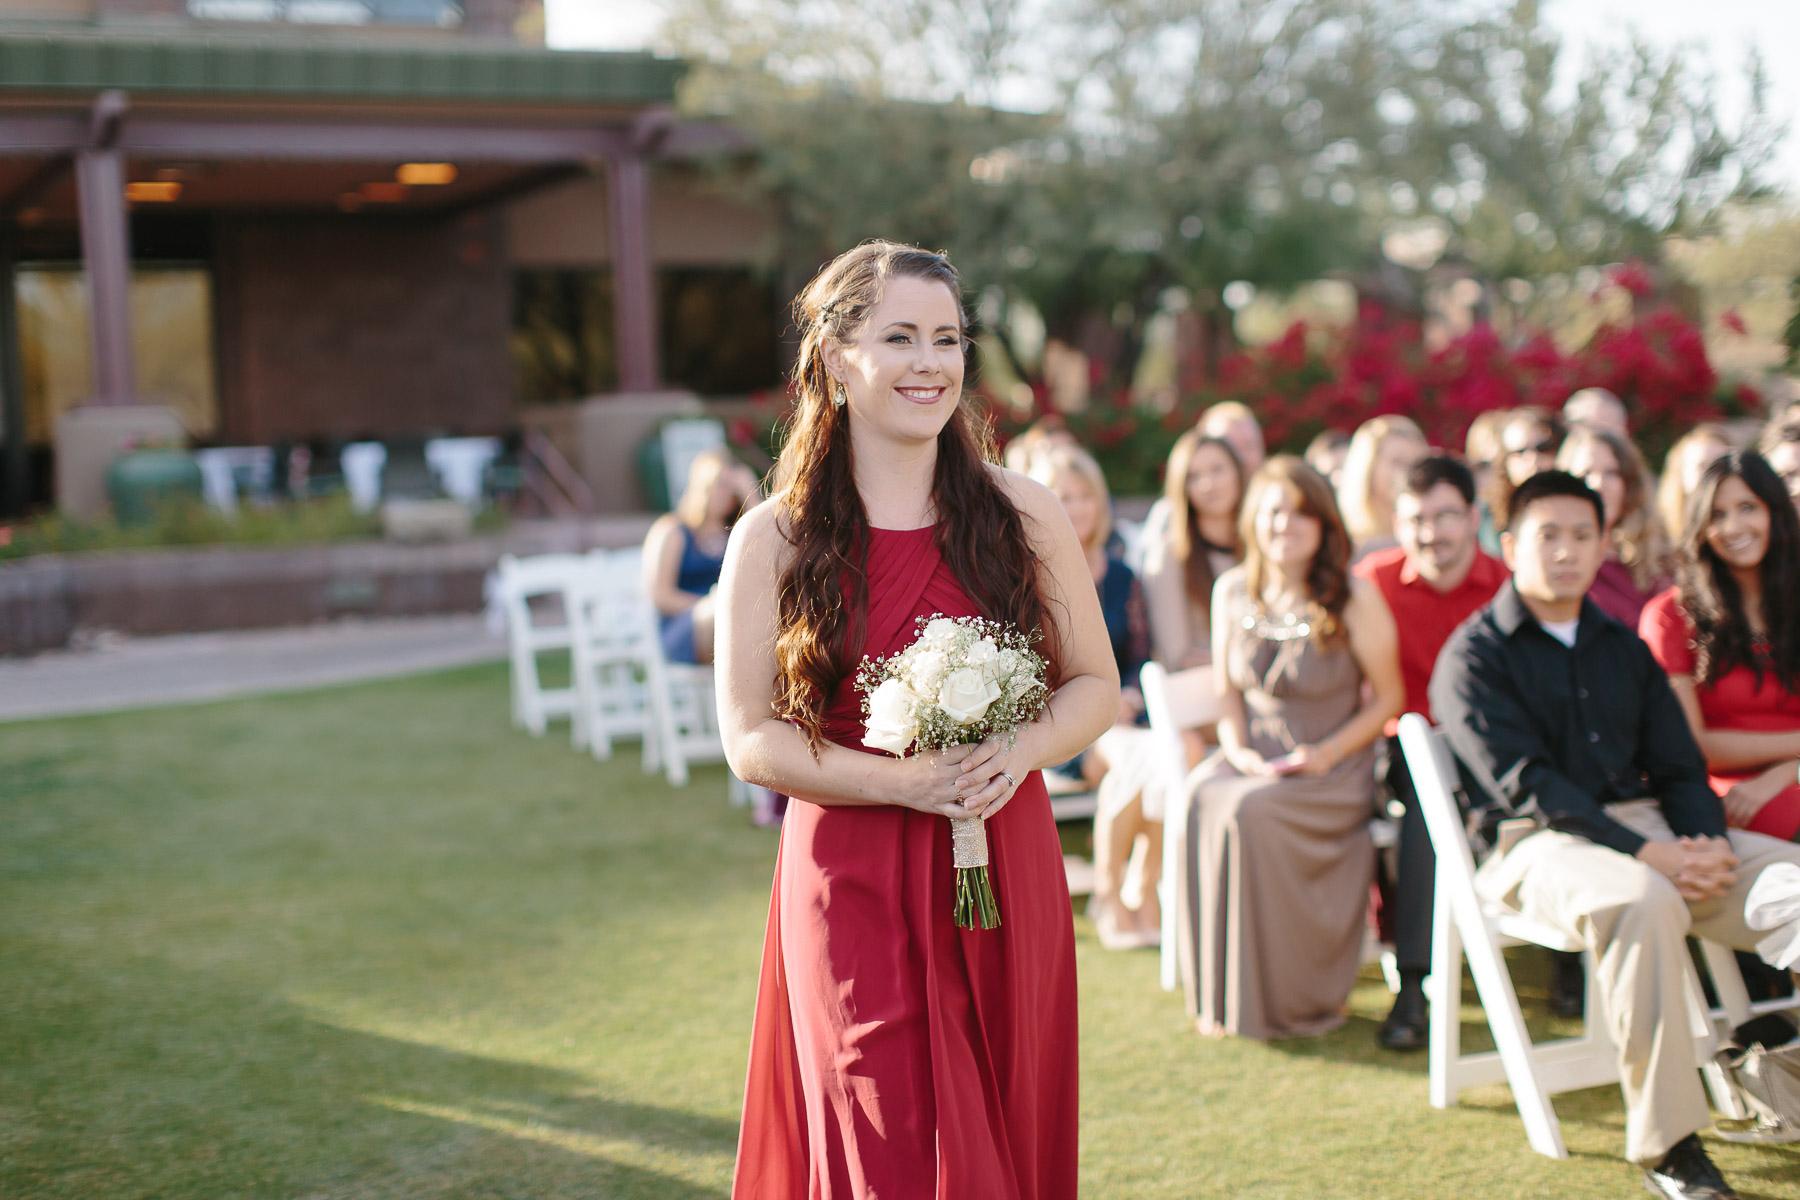 161210-Luxium-Weddings-Arizona-Matt-Jenny-Anthem-Golf-Country-Club-1023.jpg